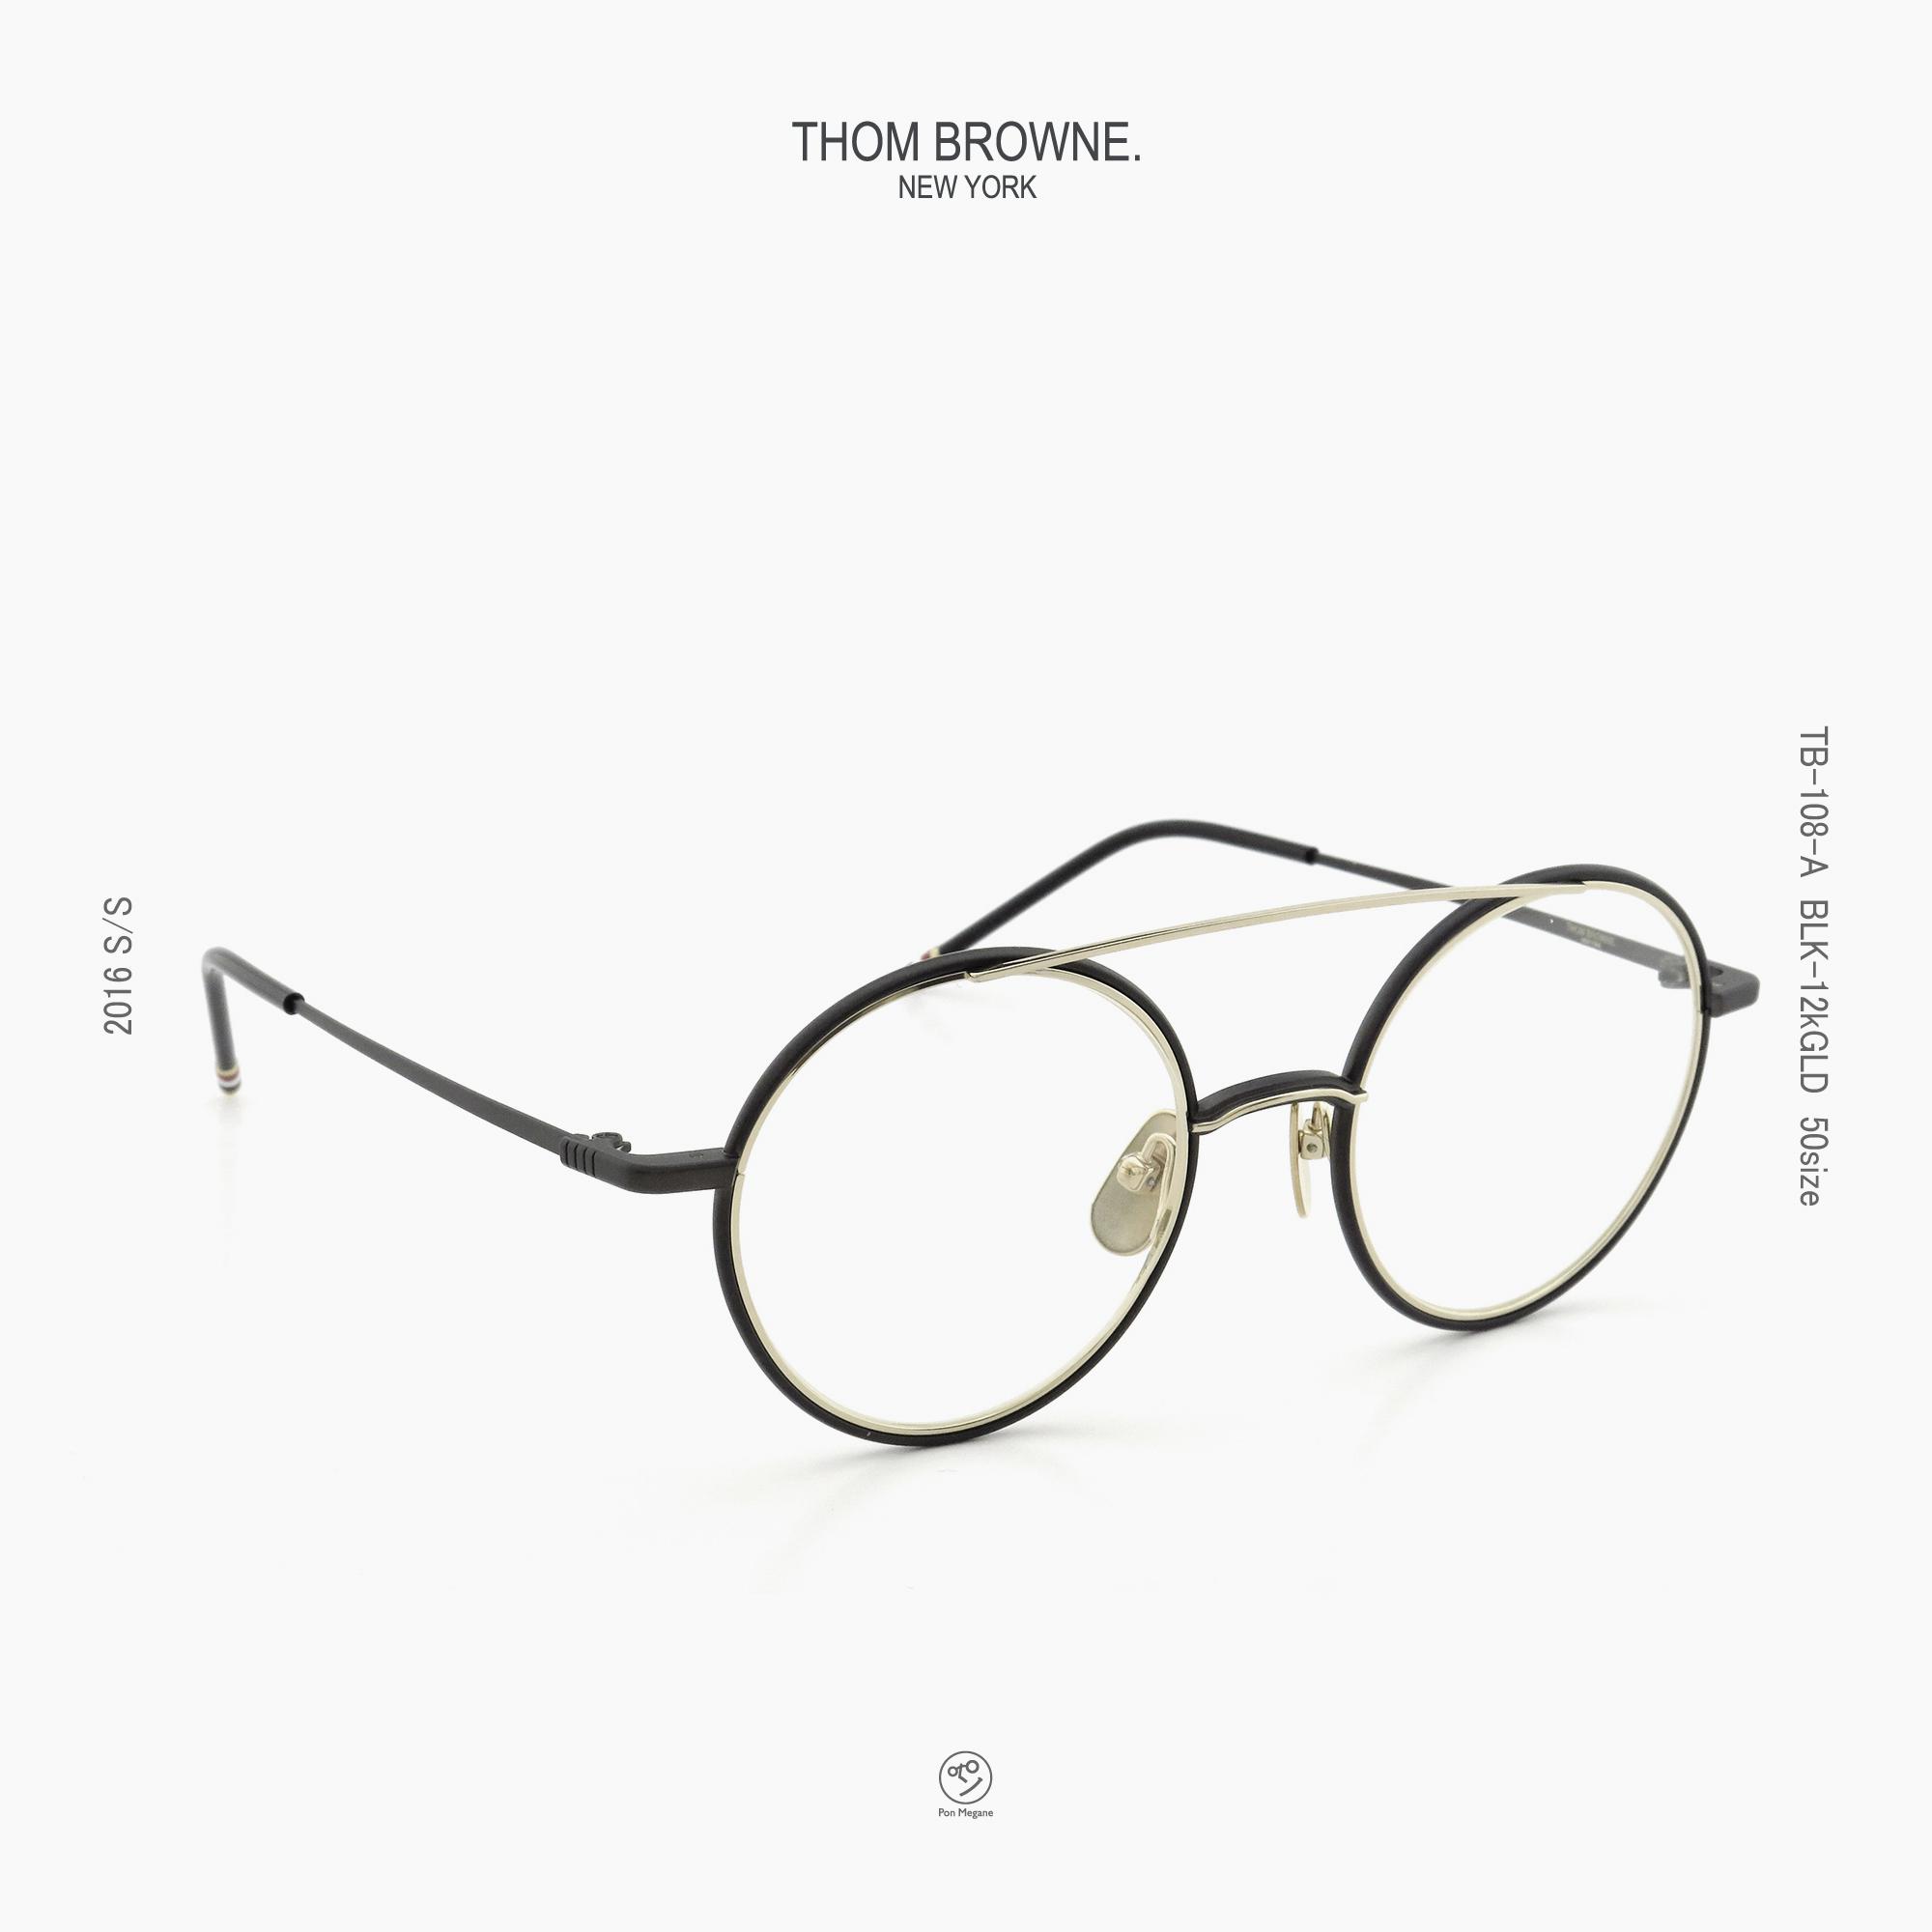 THOM-BROWNE_TB-108-A_BLK-12KGLD_50_insta